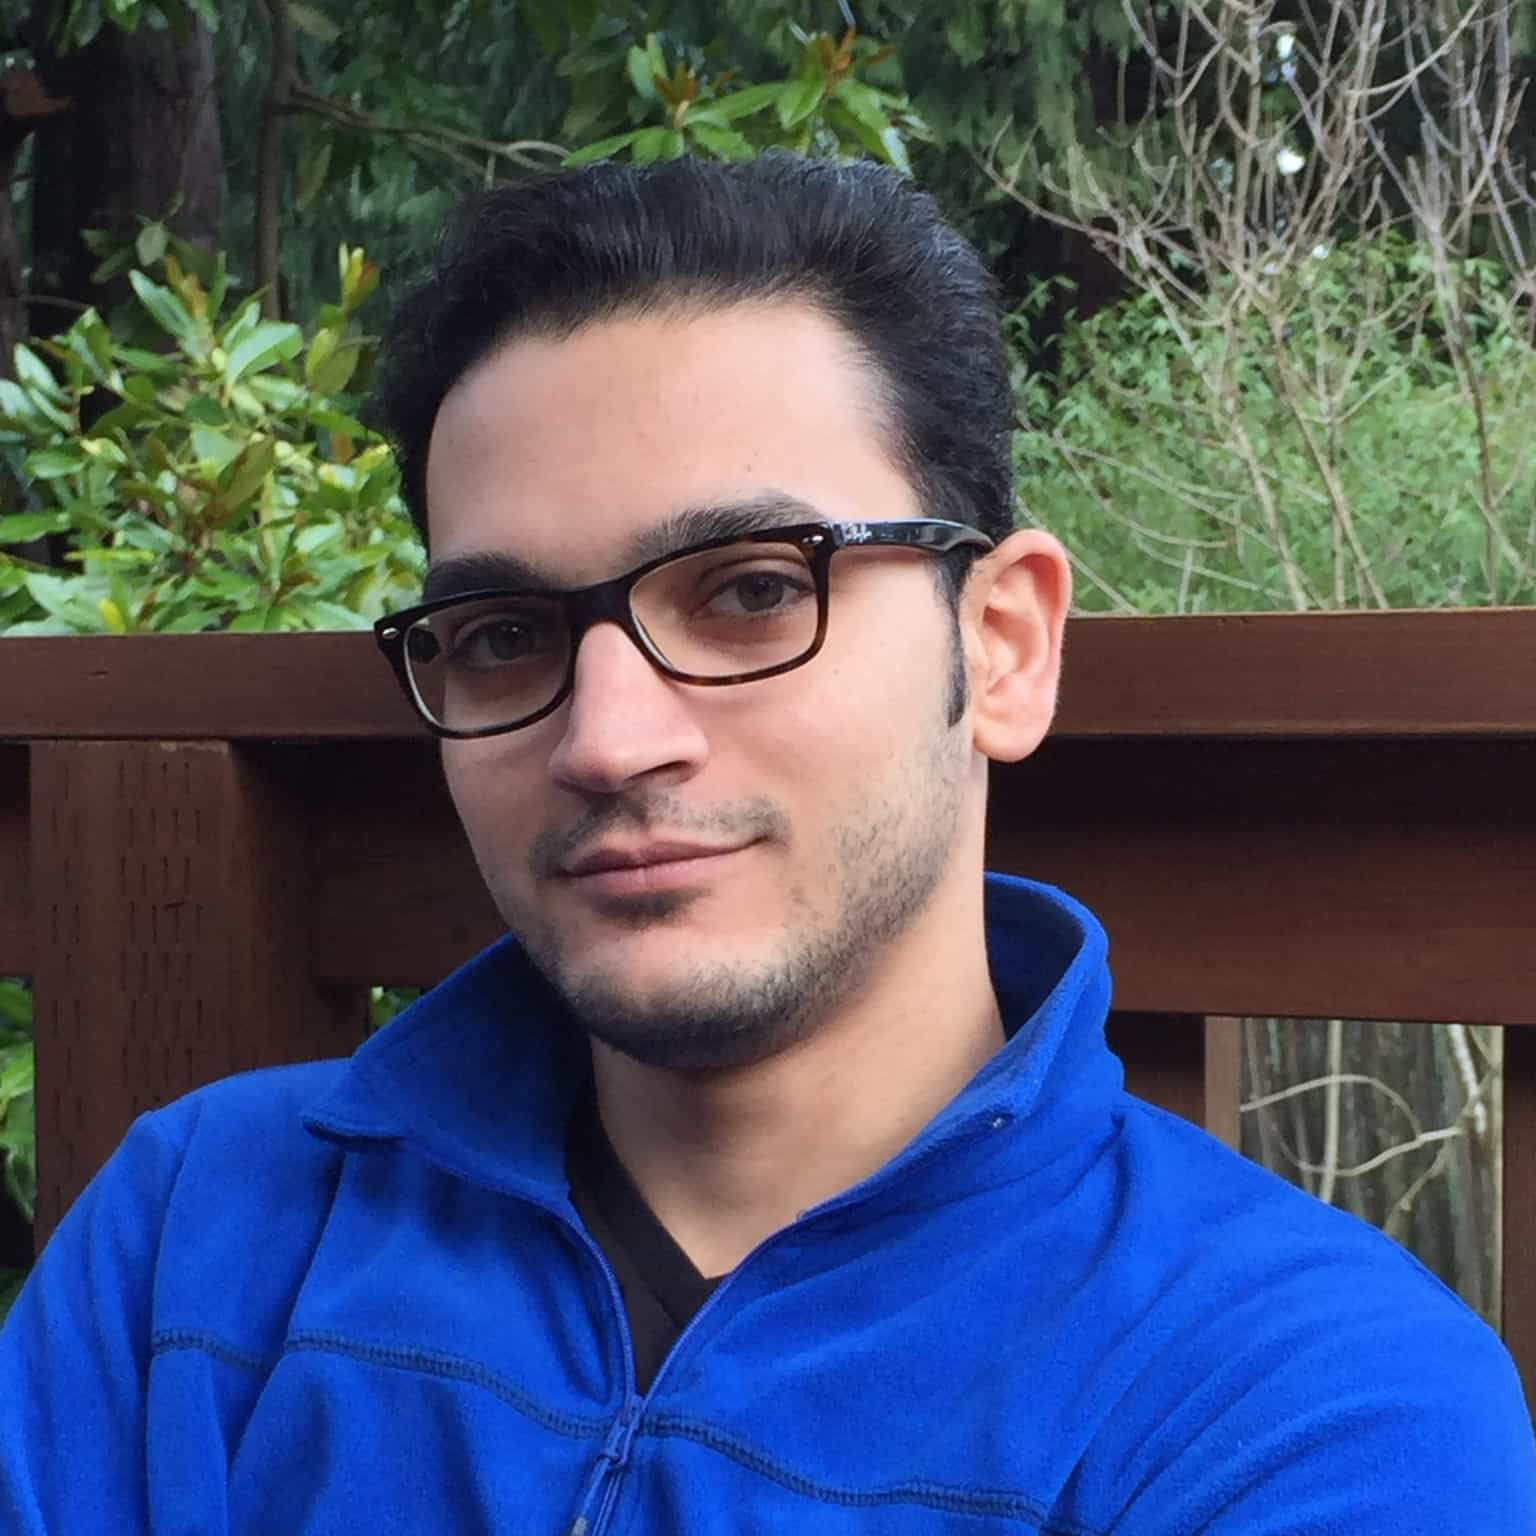 Navid Boostanimehr : Graduate Student